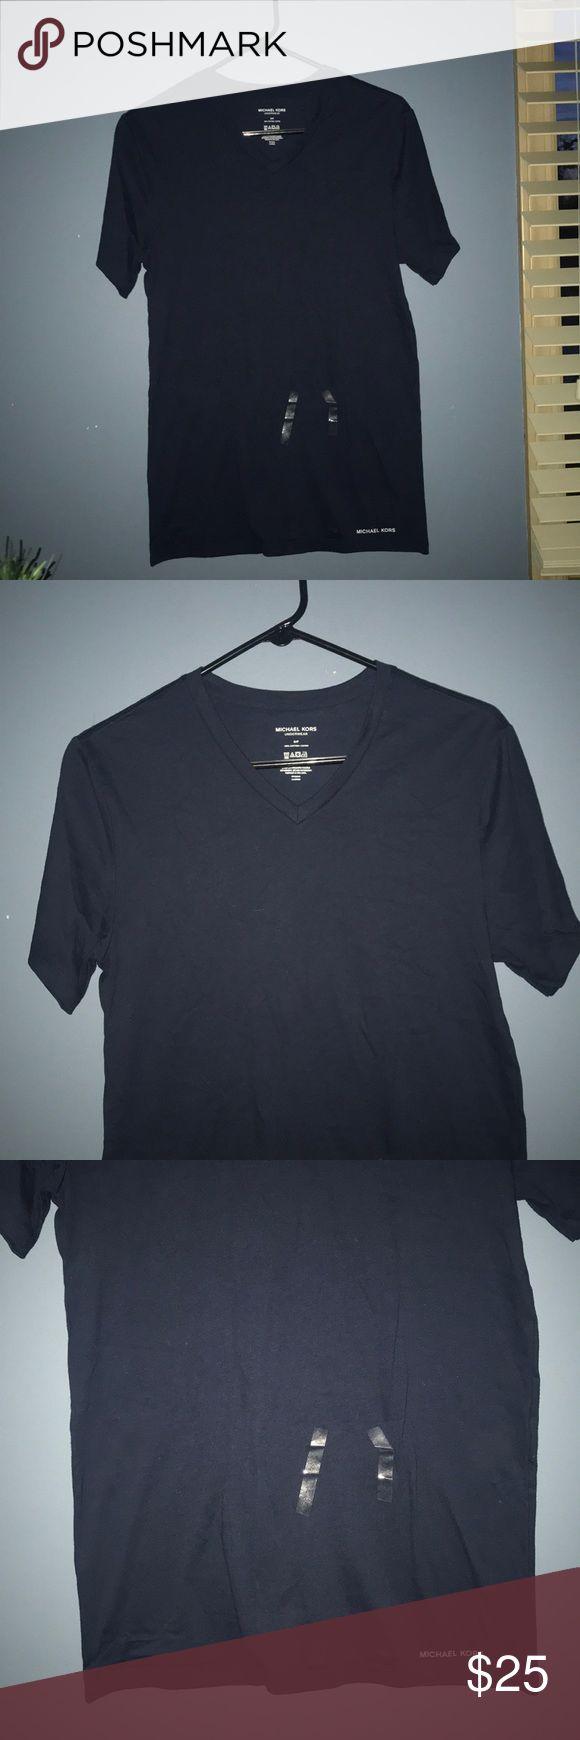 Brand new unisex Michael kors tshirt Brand new unisex Michael kors tshirt brand new Michael Kors Shirts Tees - Short Sleeve